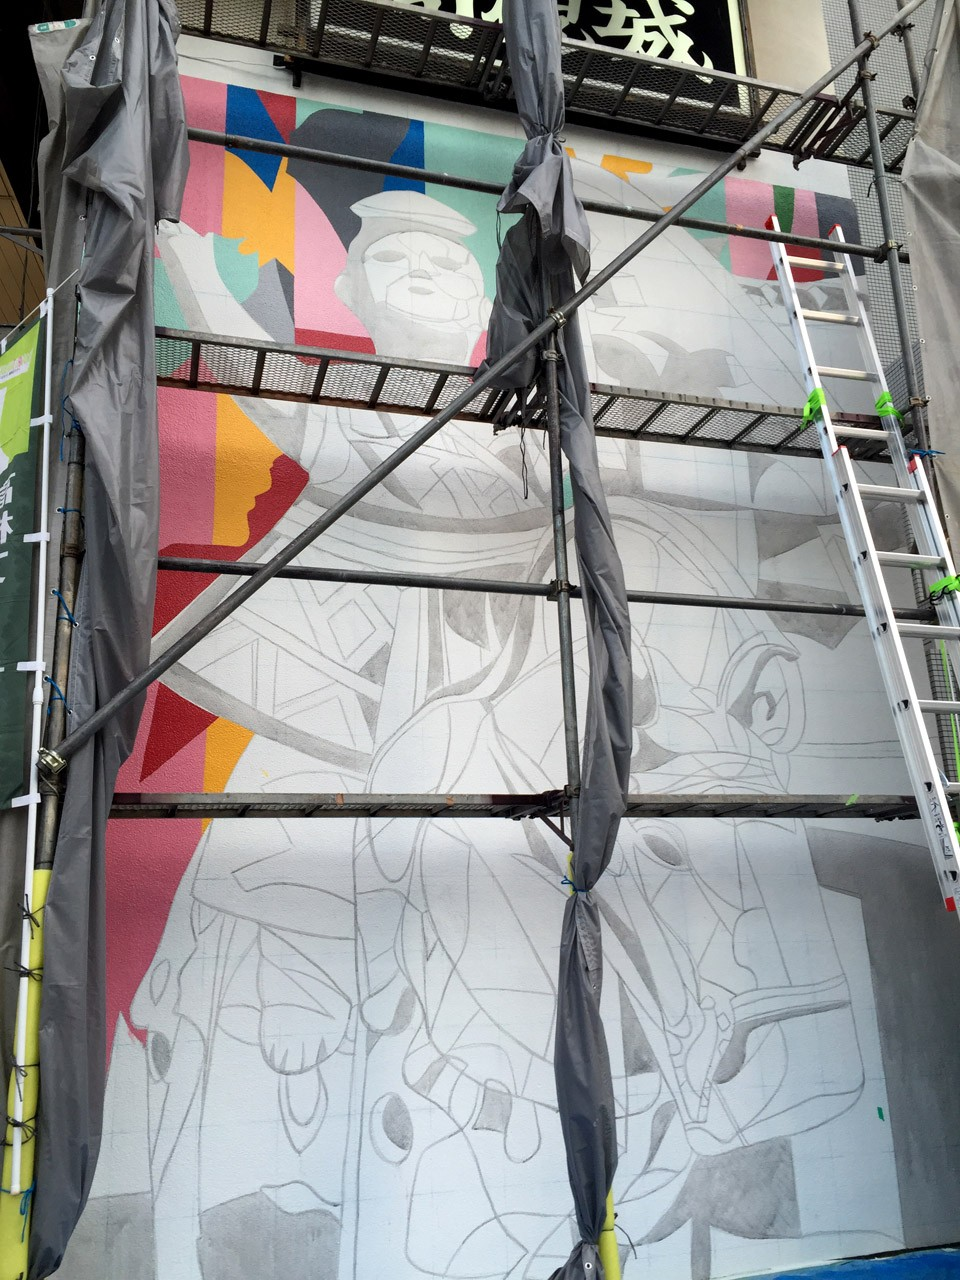 1280-outline-2-DAAS_takatsuki-haniwa-mural-3